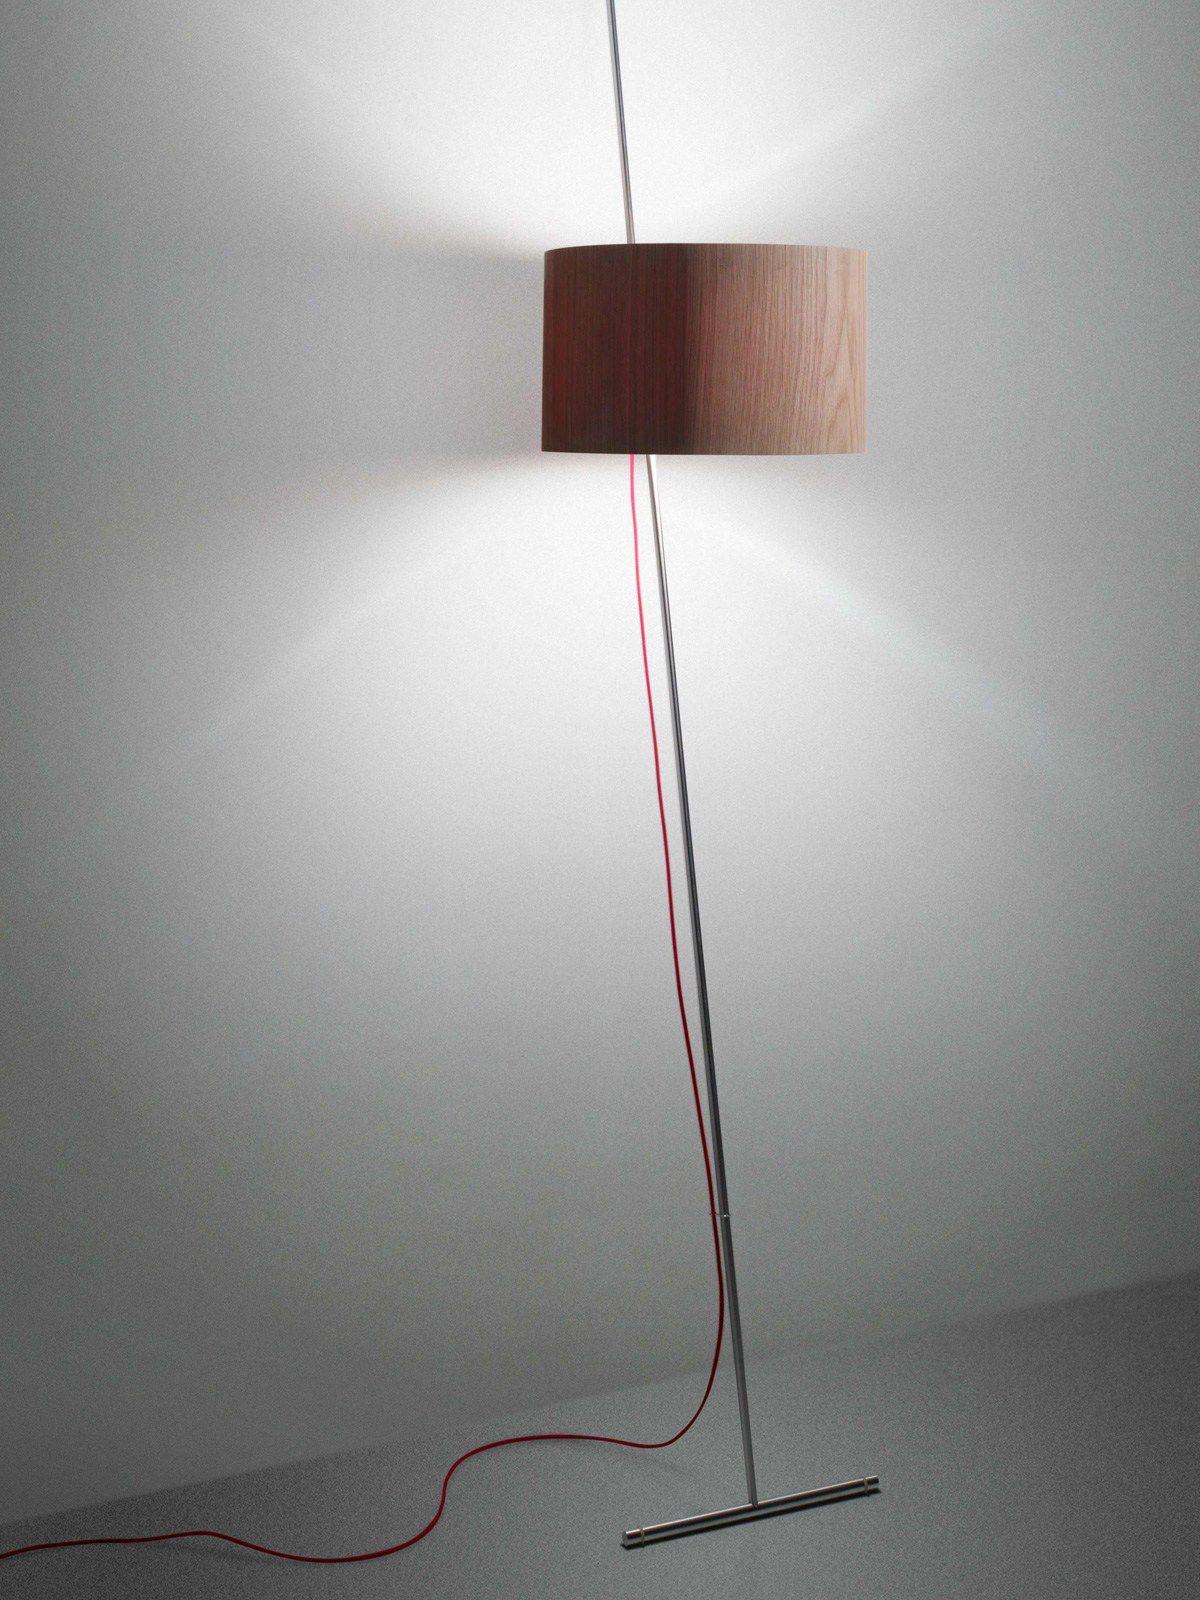 Lift Lampen Und Leuchten Lampenschirm Lampe